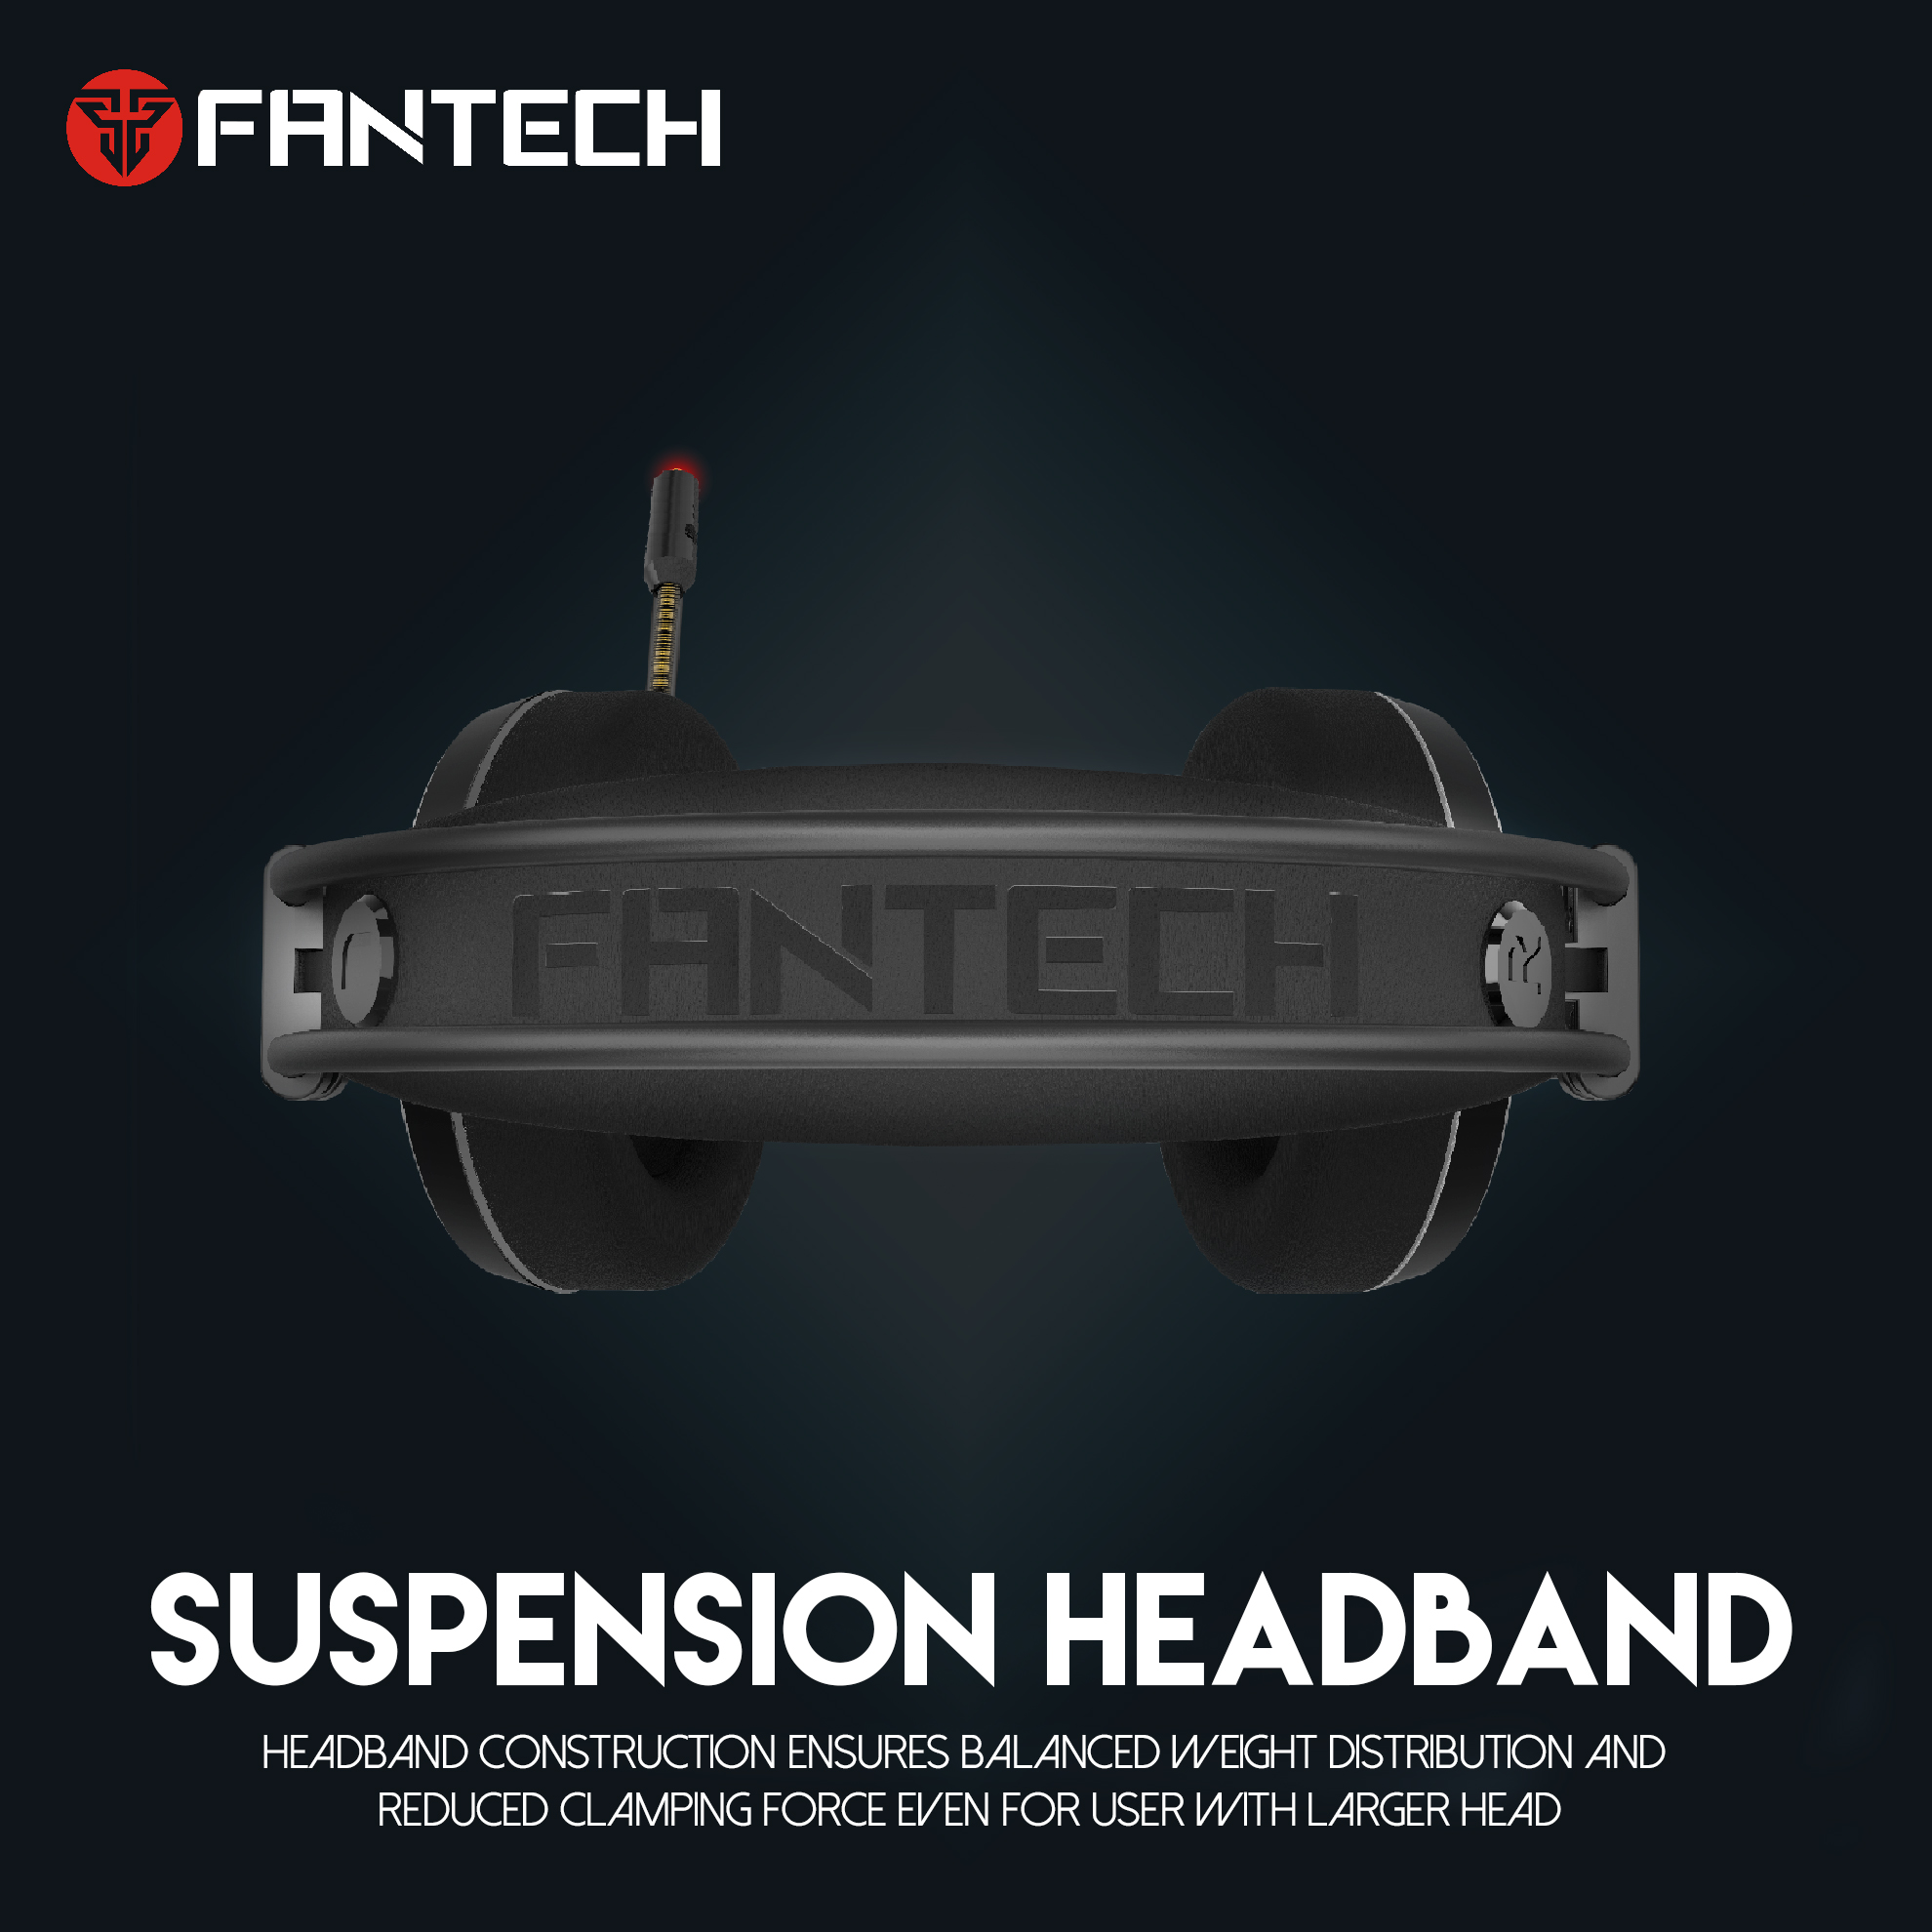 Fantech HG23 OCTANE 7.1 Gaming Headset 9